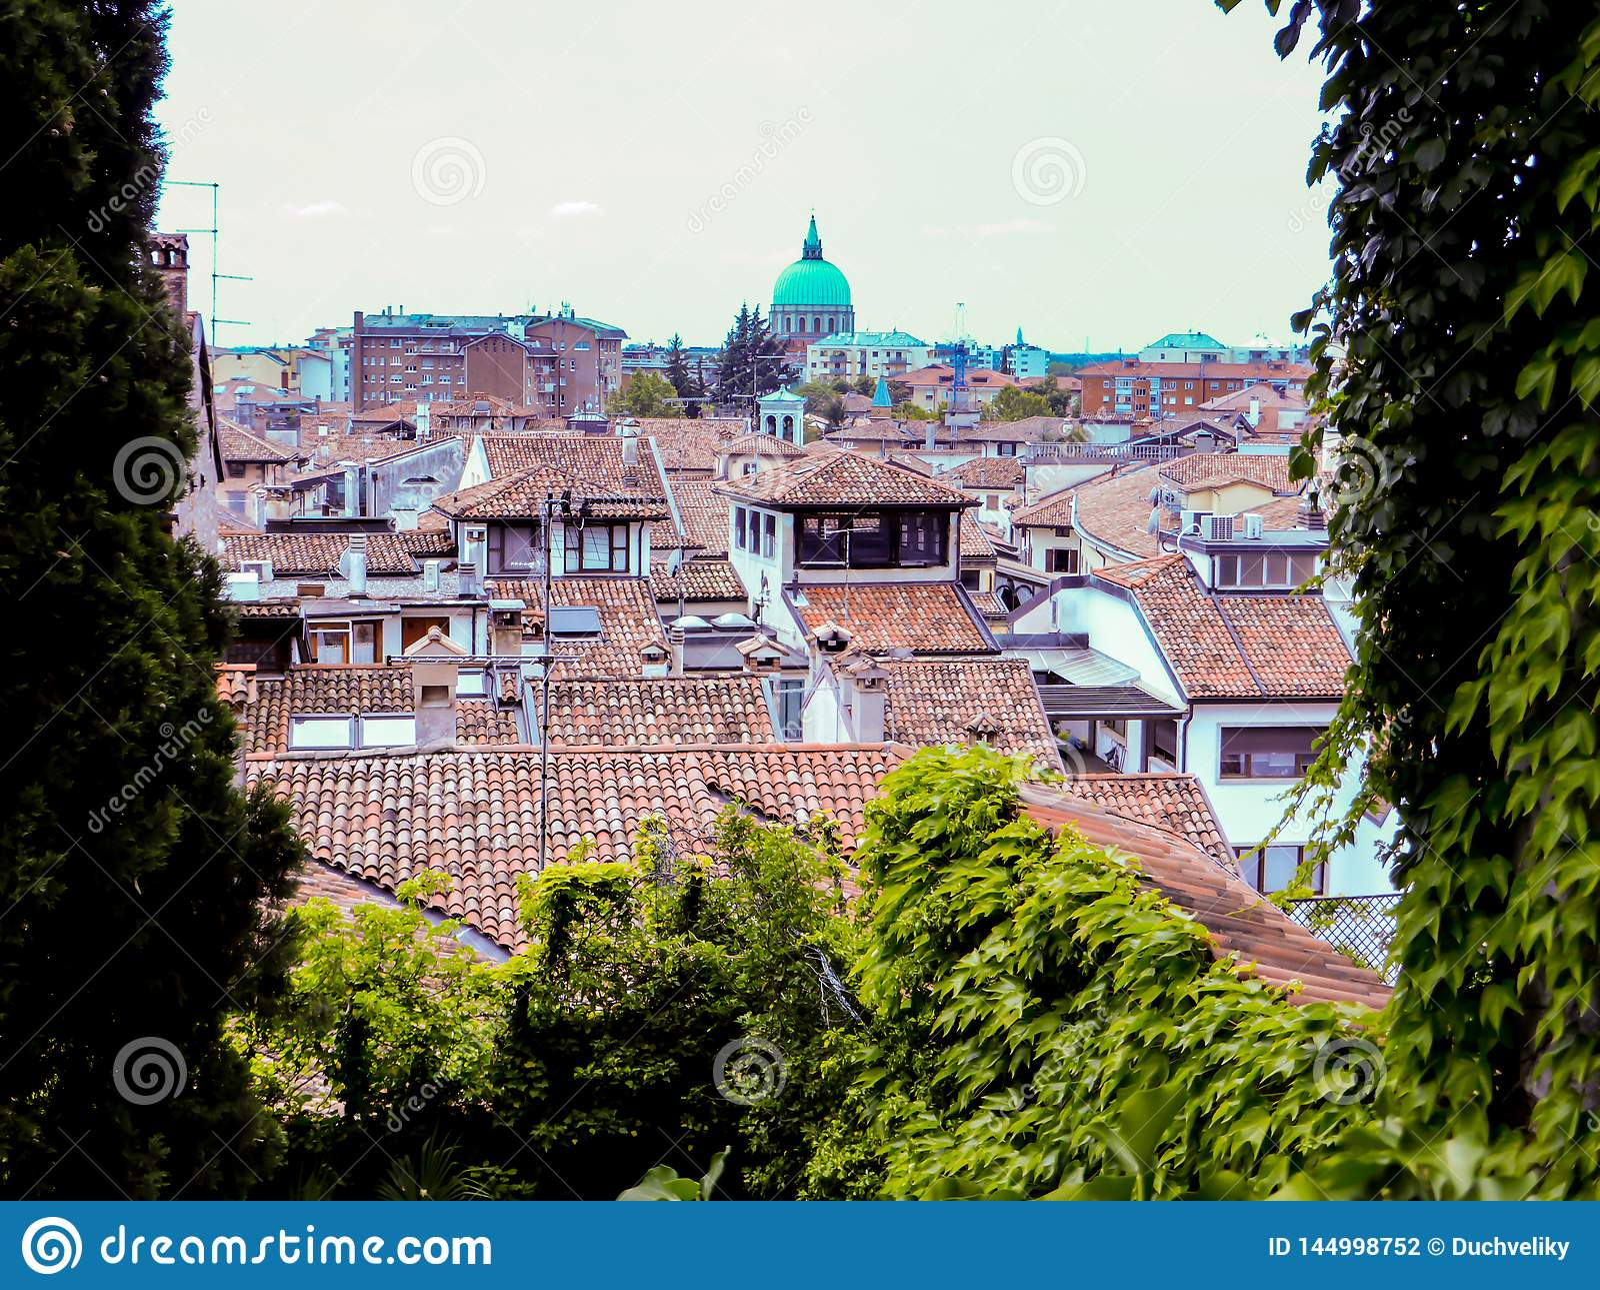 Udine Ιταλία - όμορφη φωτογραφία της πόλης Udine